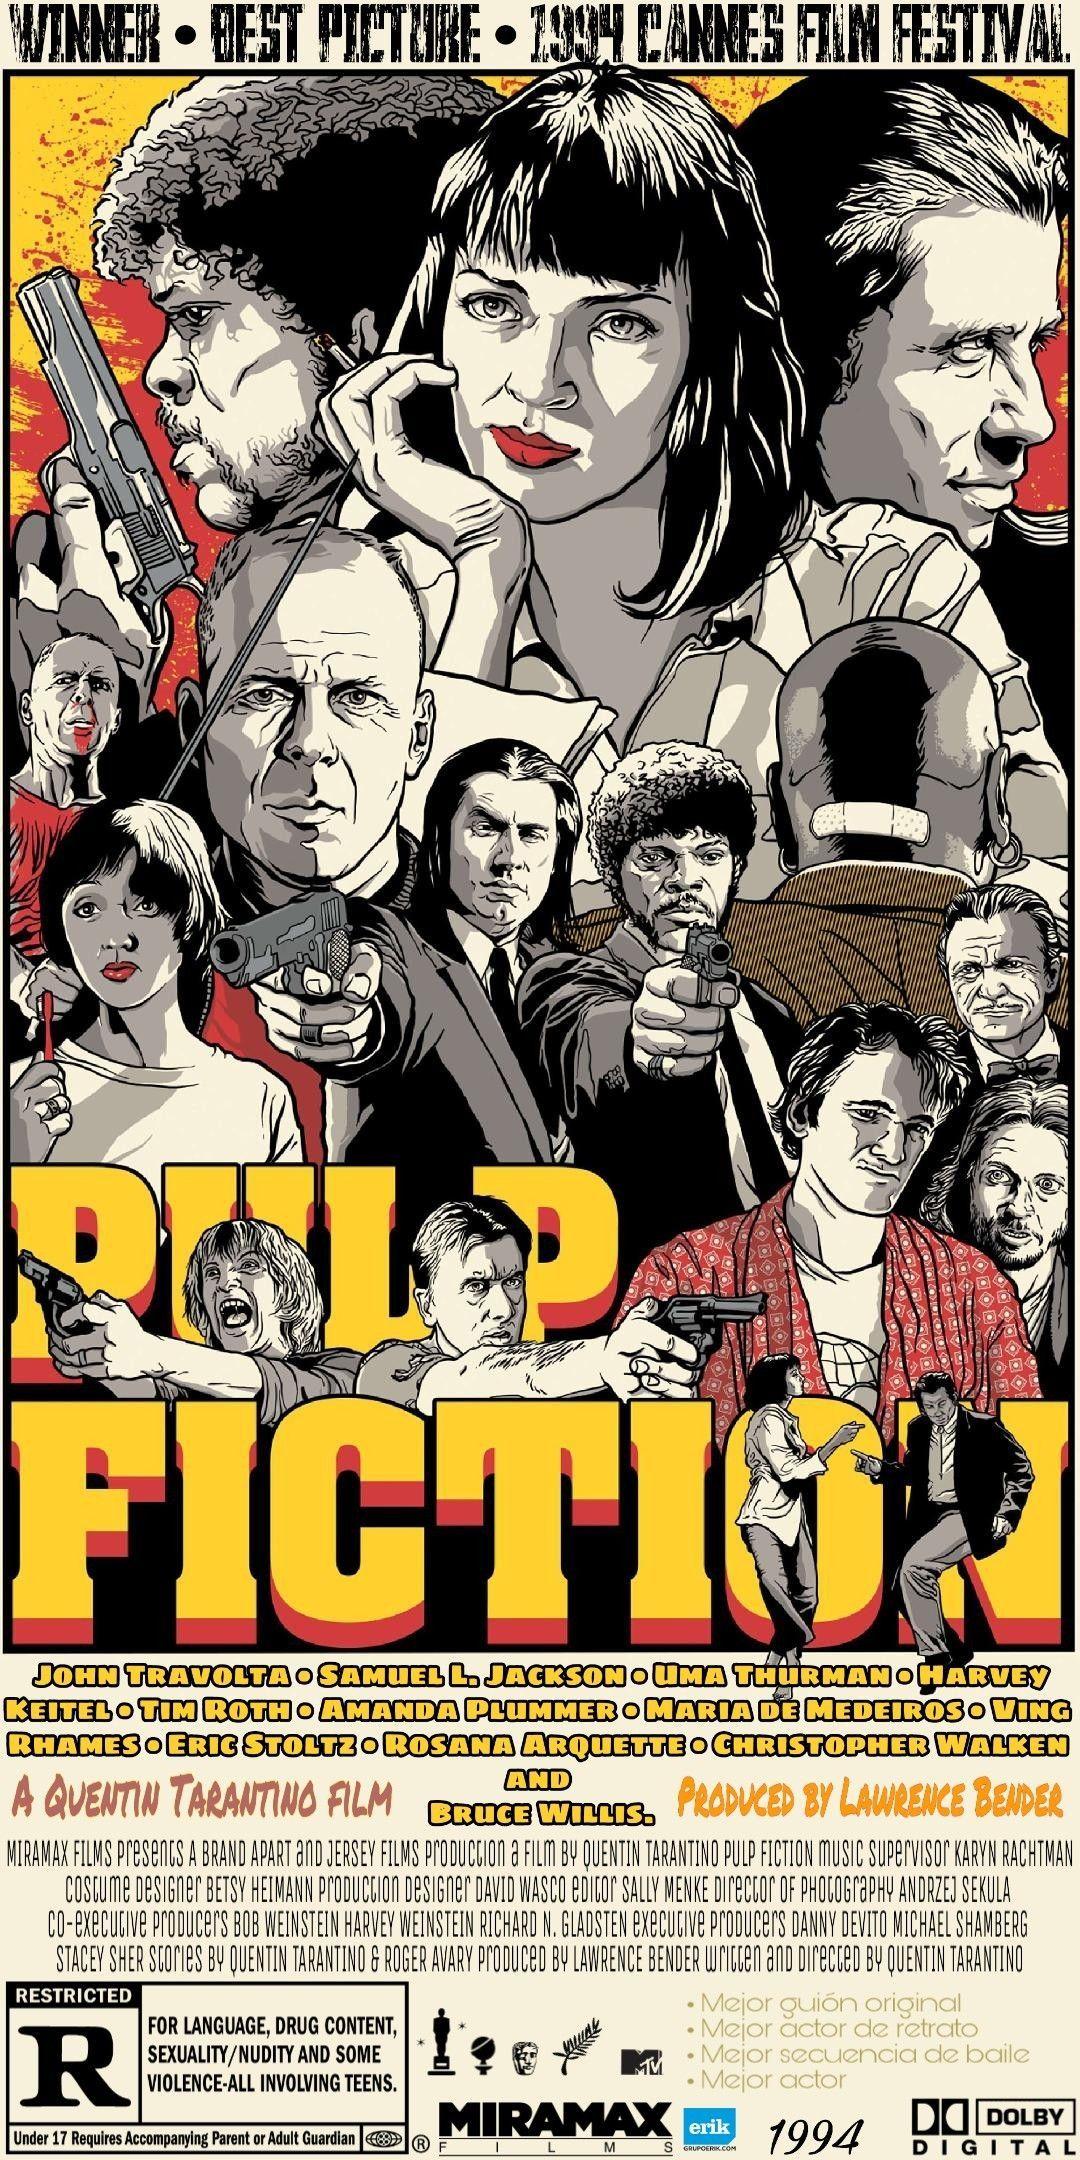 Wallpaper Pulp Fiction Quentin Tarantino Fondo De Pantalla Filmposters Wallpaper Pulp Fiction Quentin Ta Pulp Fiction Classic Movie Posters Best Movie Posters